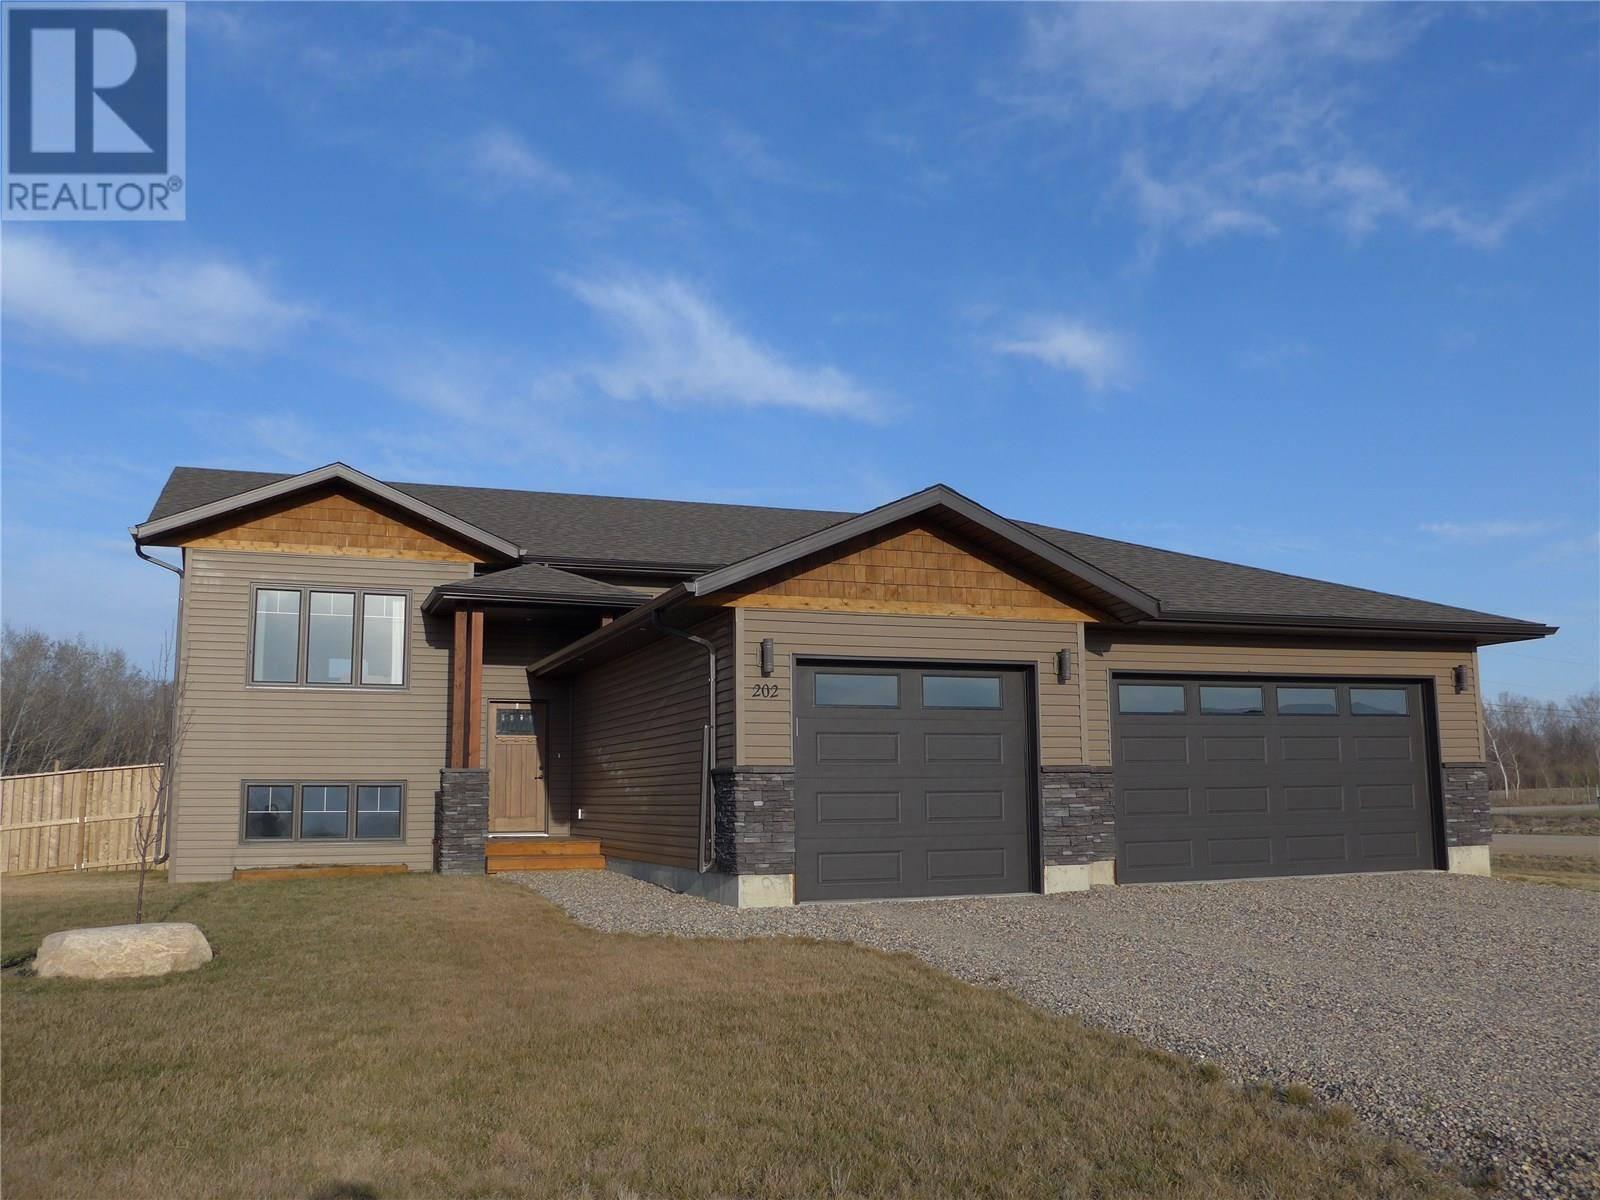 House for sale at 202 Hill Rd North Hepburn Saskatchewan - MLS: SK787877